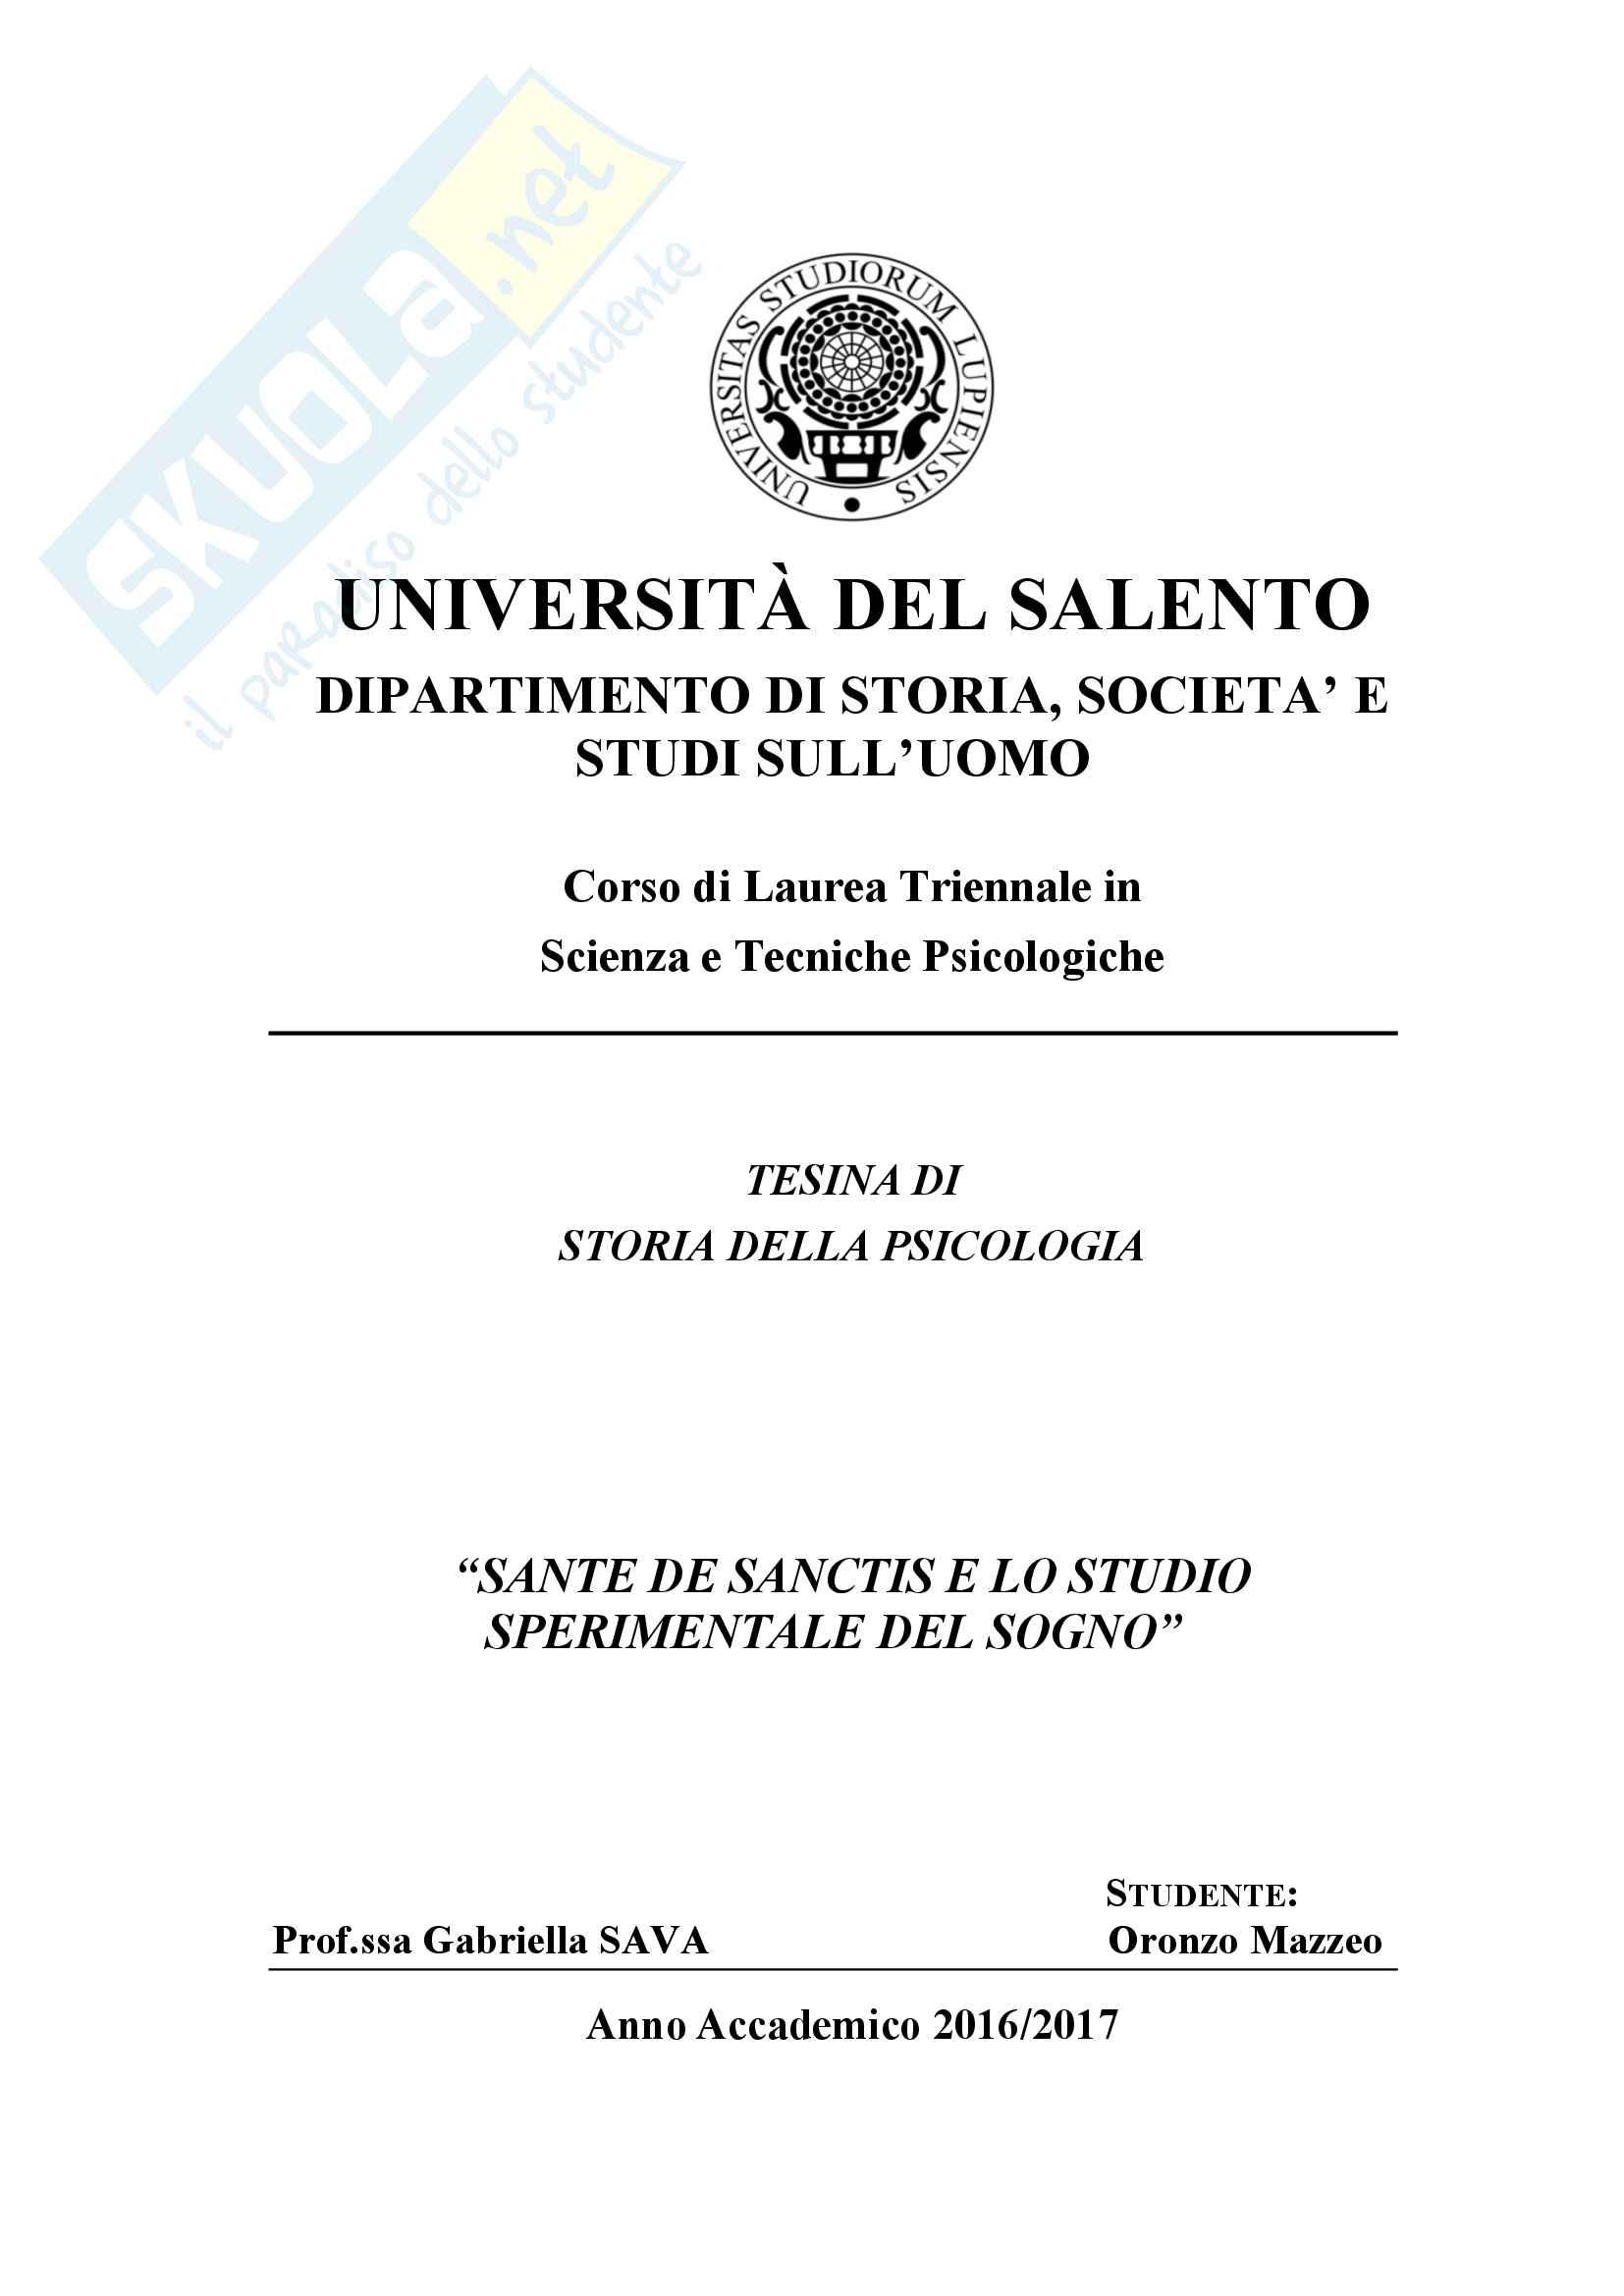 Storia della Psicologia - Tesina su Sante De Sanctis